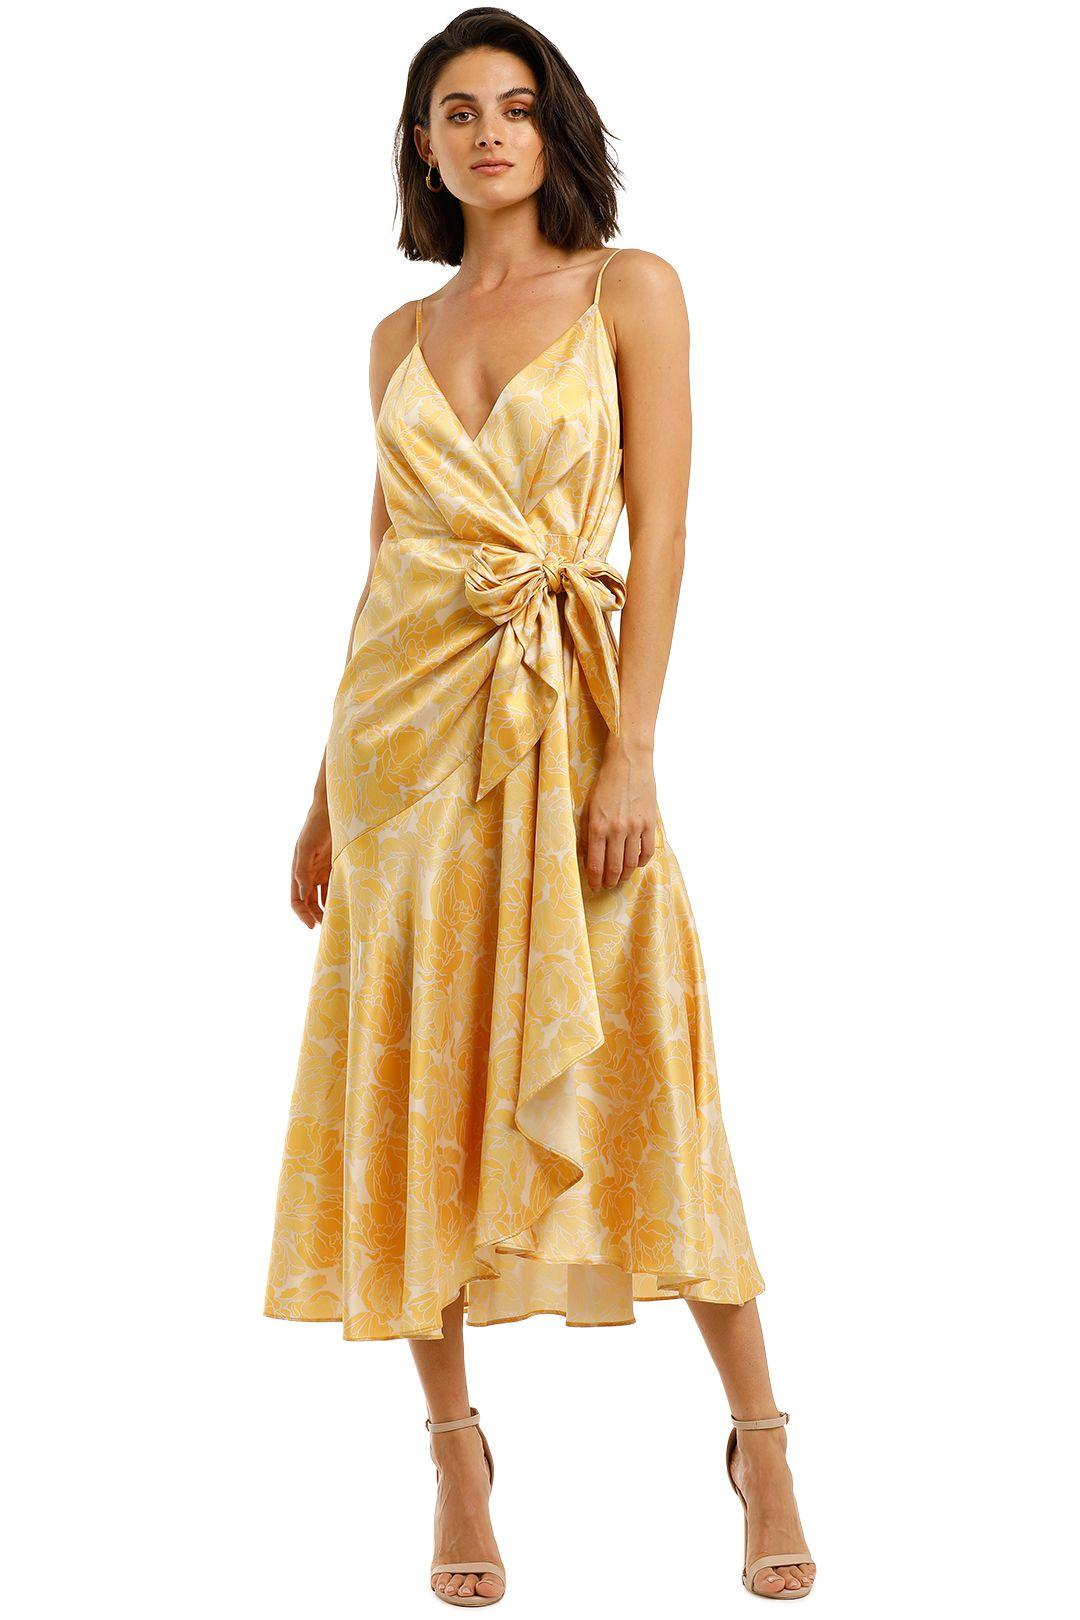 Acler-Dana-Wrap-Dress-Lemon-Front